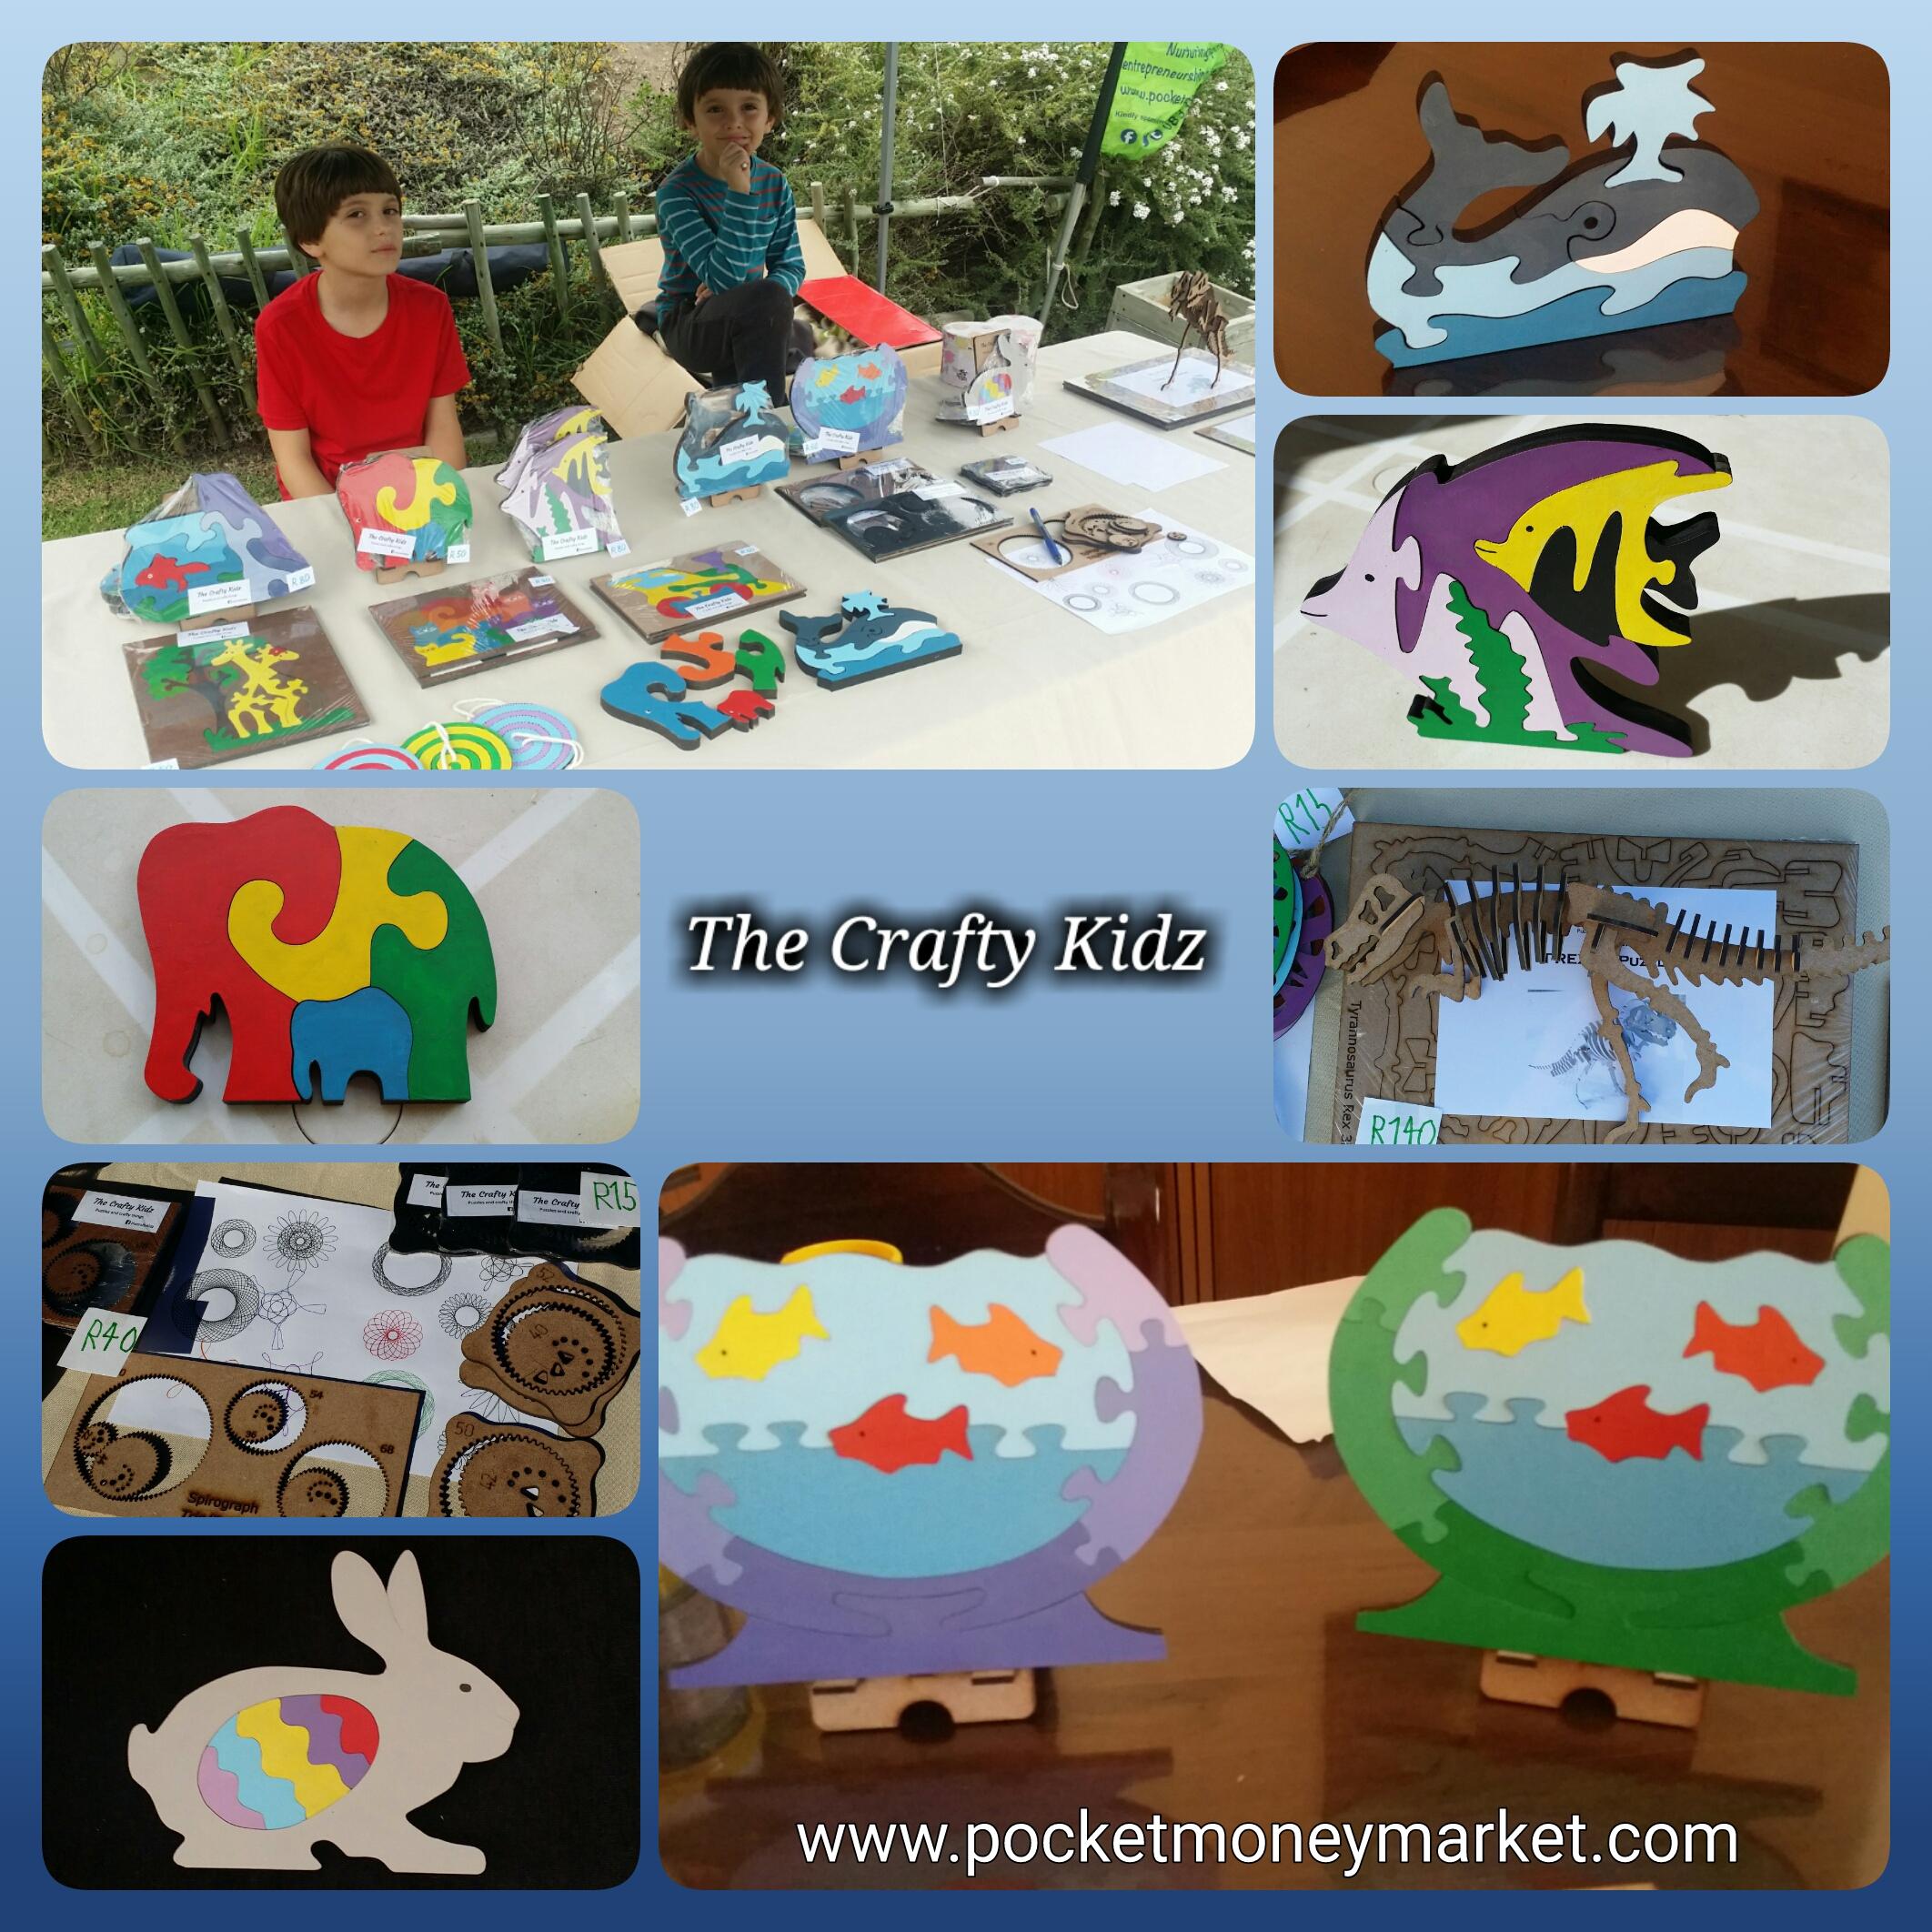 Market day fundraiser prizes for kids